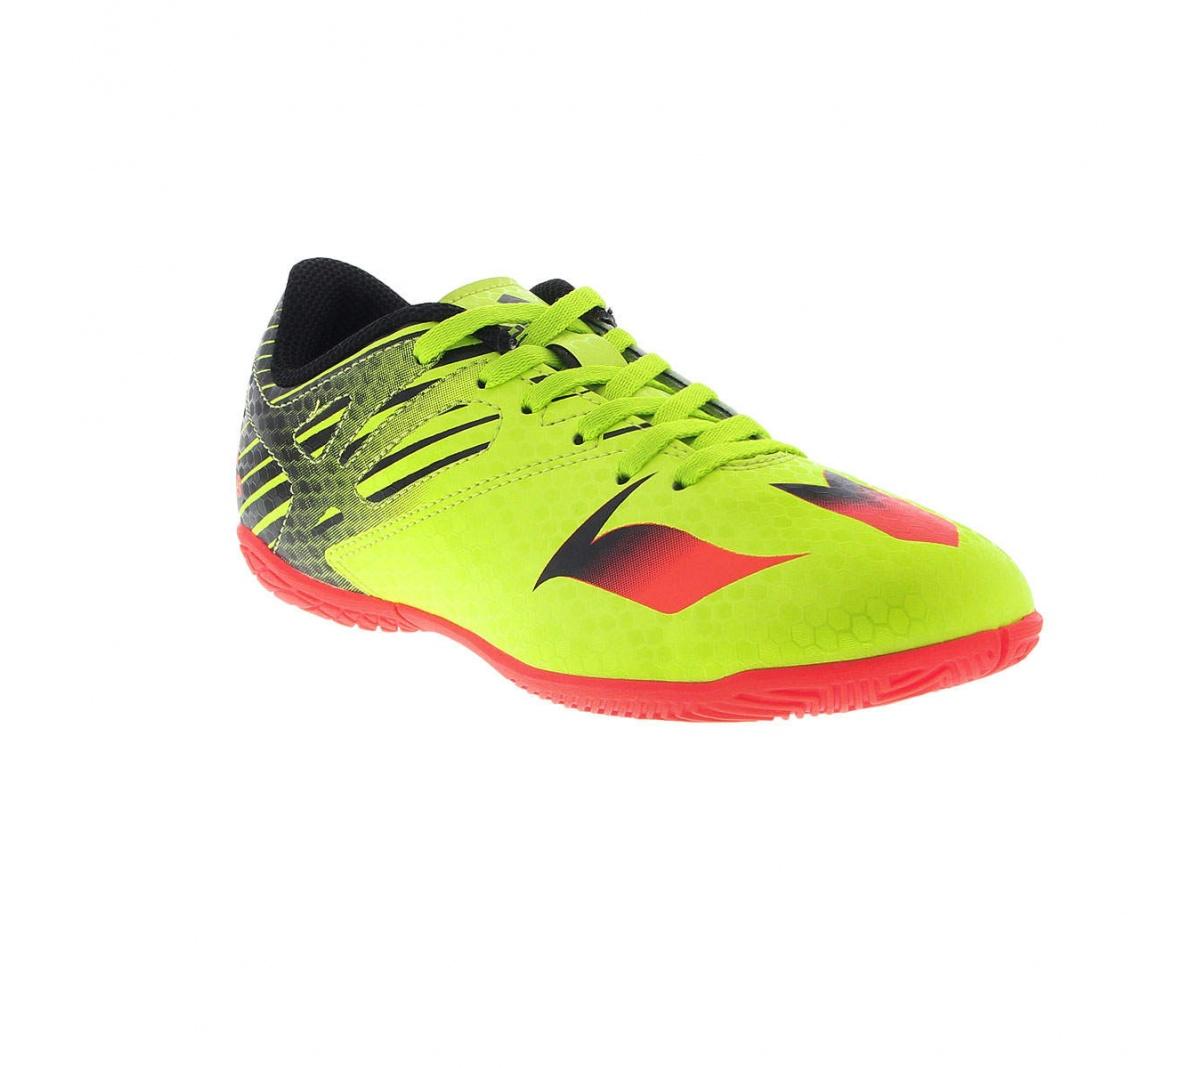 Tênis Adidas Messi 15 Futsal Infantil Tênis Adidas Messi 15 Futsal Infantil  ... a338581523d4a